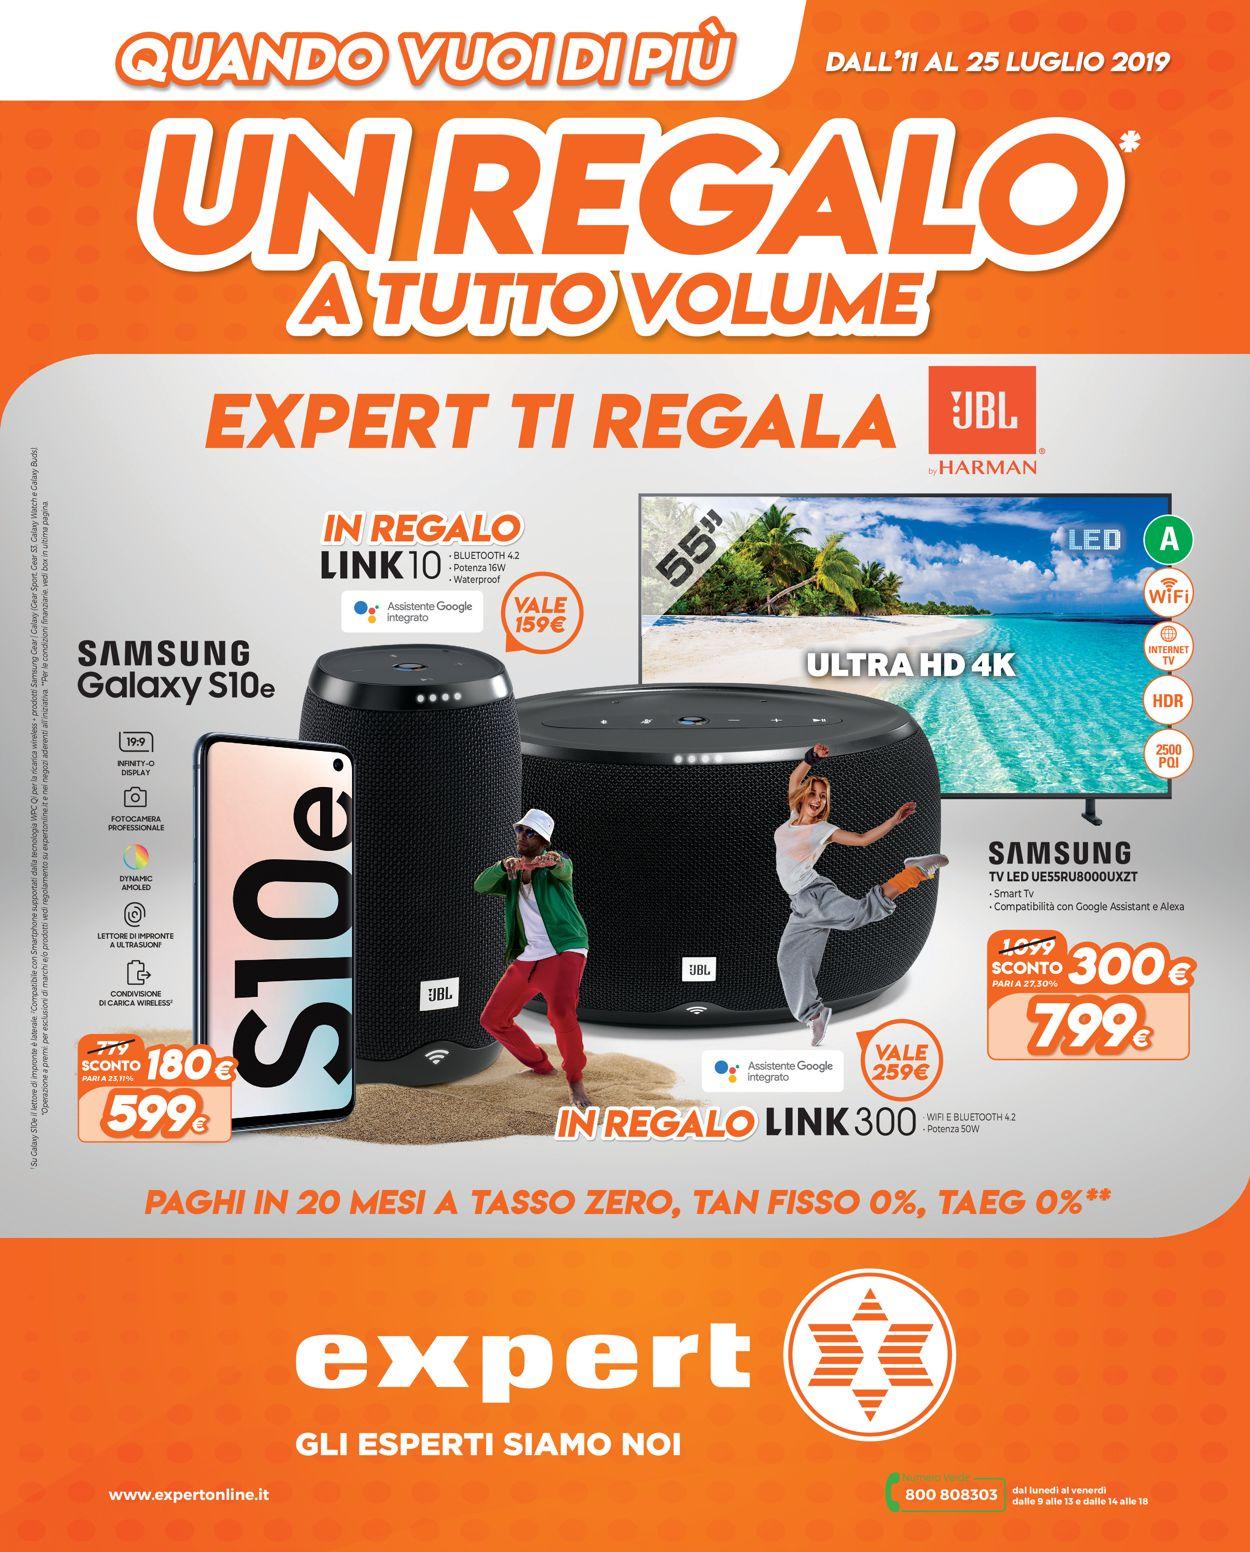 Volantino Iperal - Offerte 11/07-25/07/2019